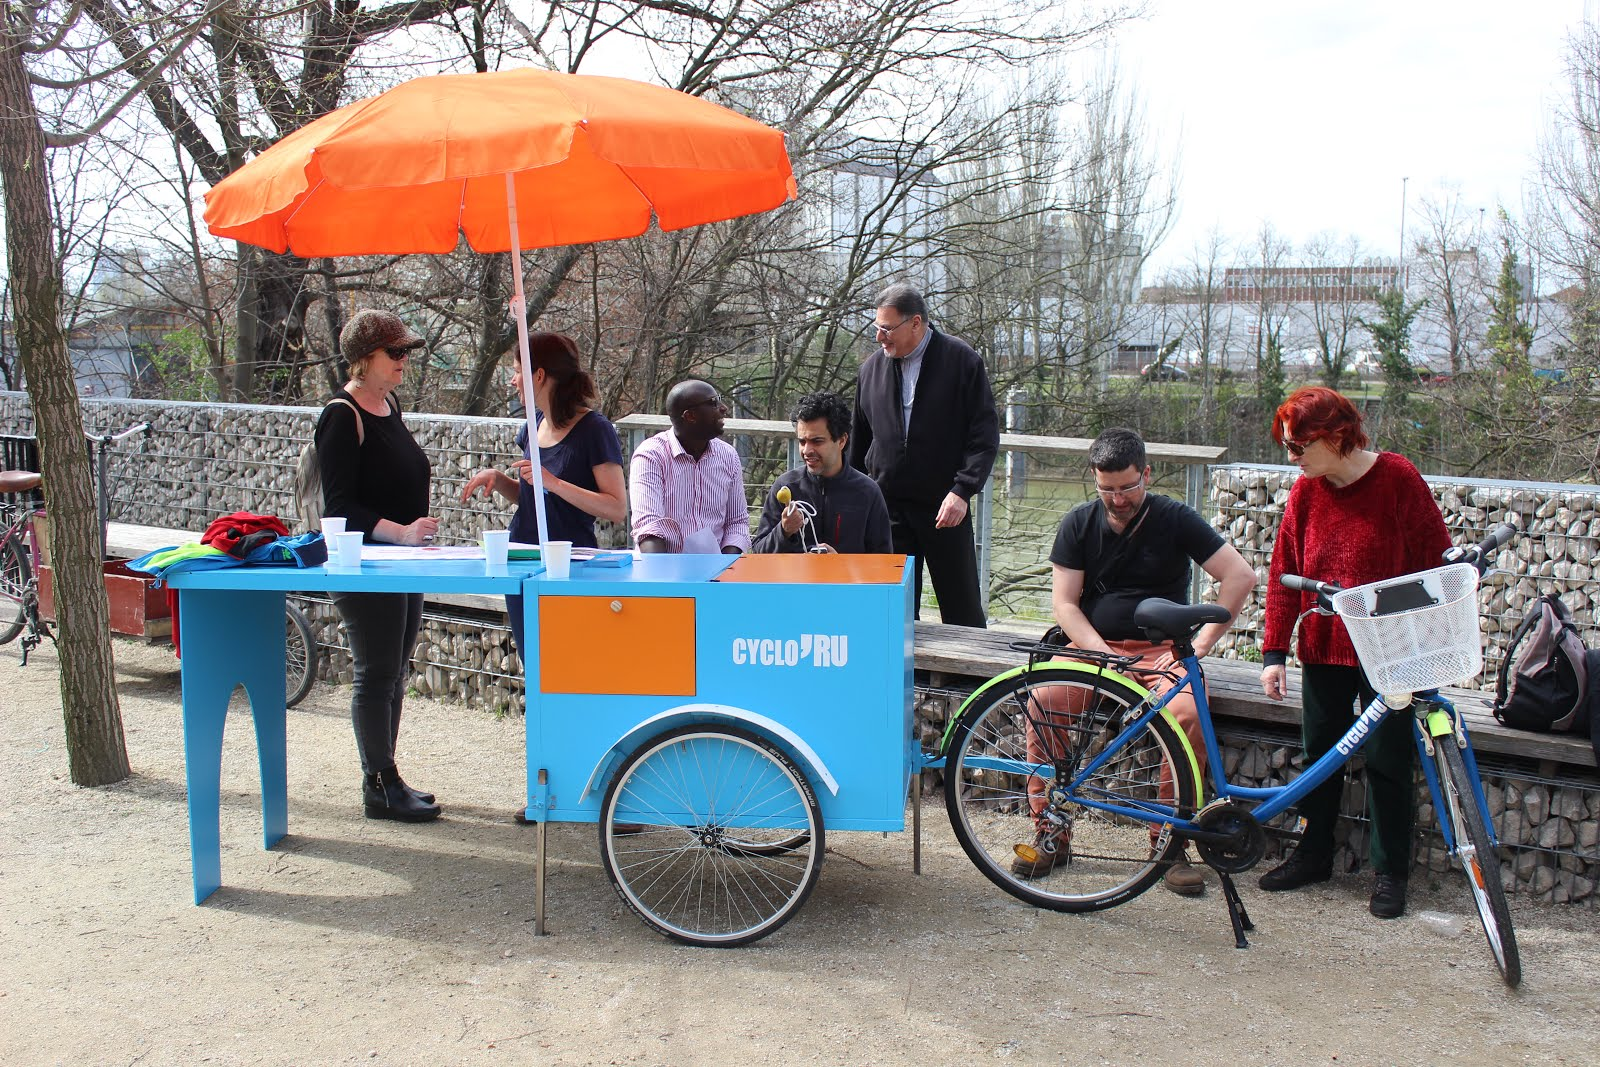 Le Cyclo'RU - Made in Cityside